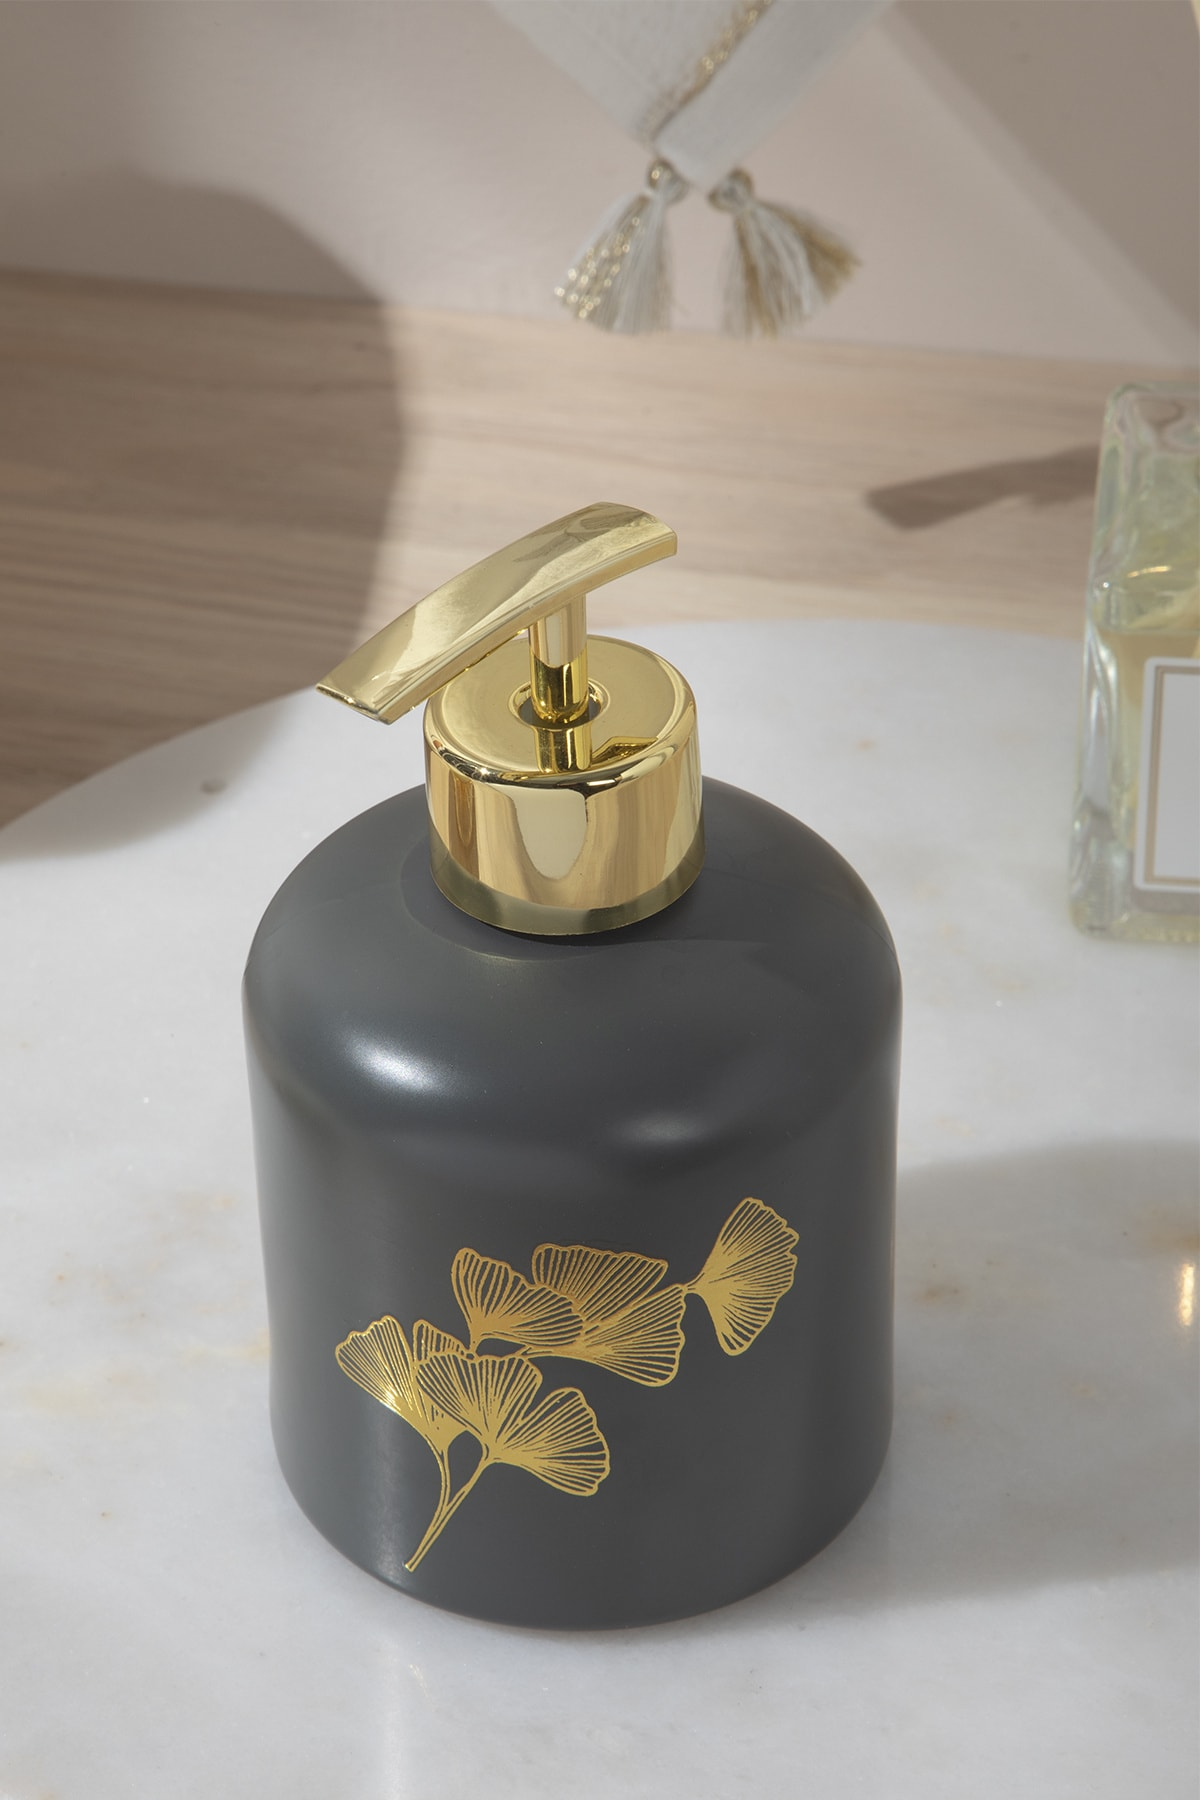 Gingko Cam Banyo Sıvı Sabunluk 8x8x14 Cm Lacivert